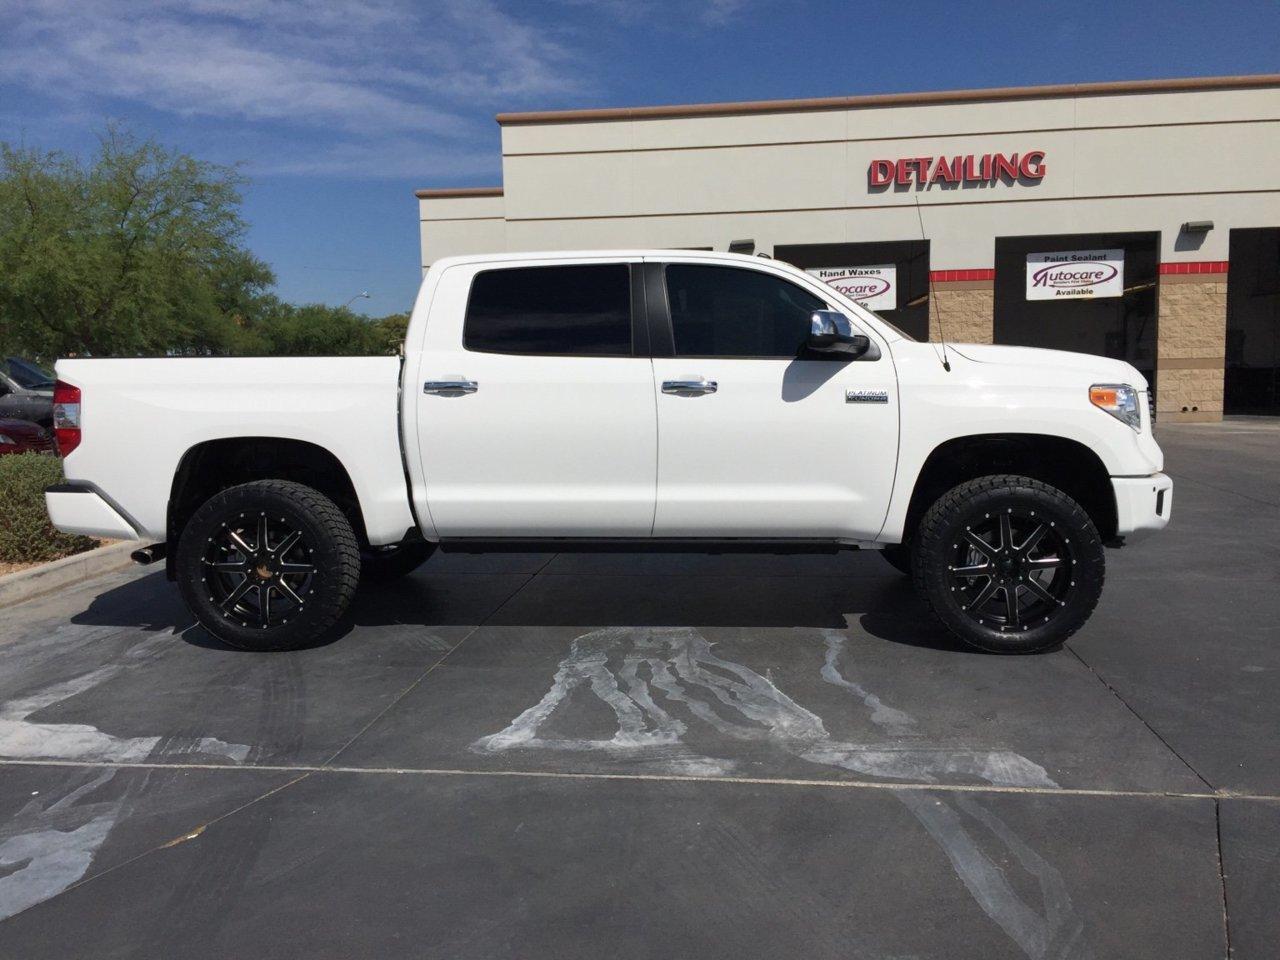 2016 Tundra Platinum lift and wheels | Toyota Tundra Forum